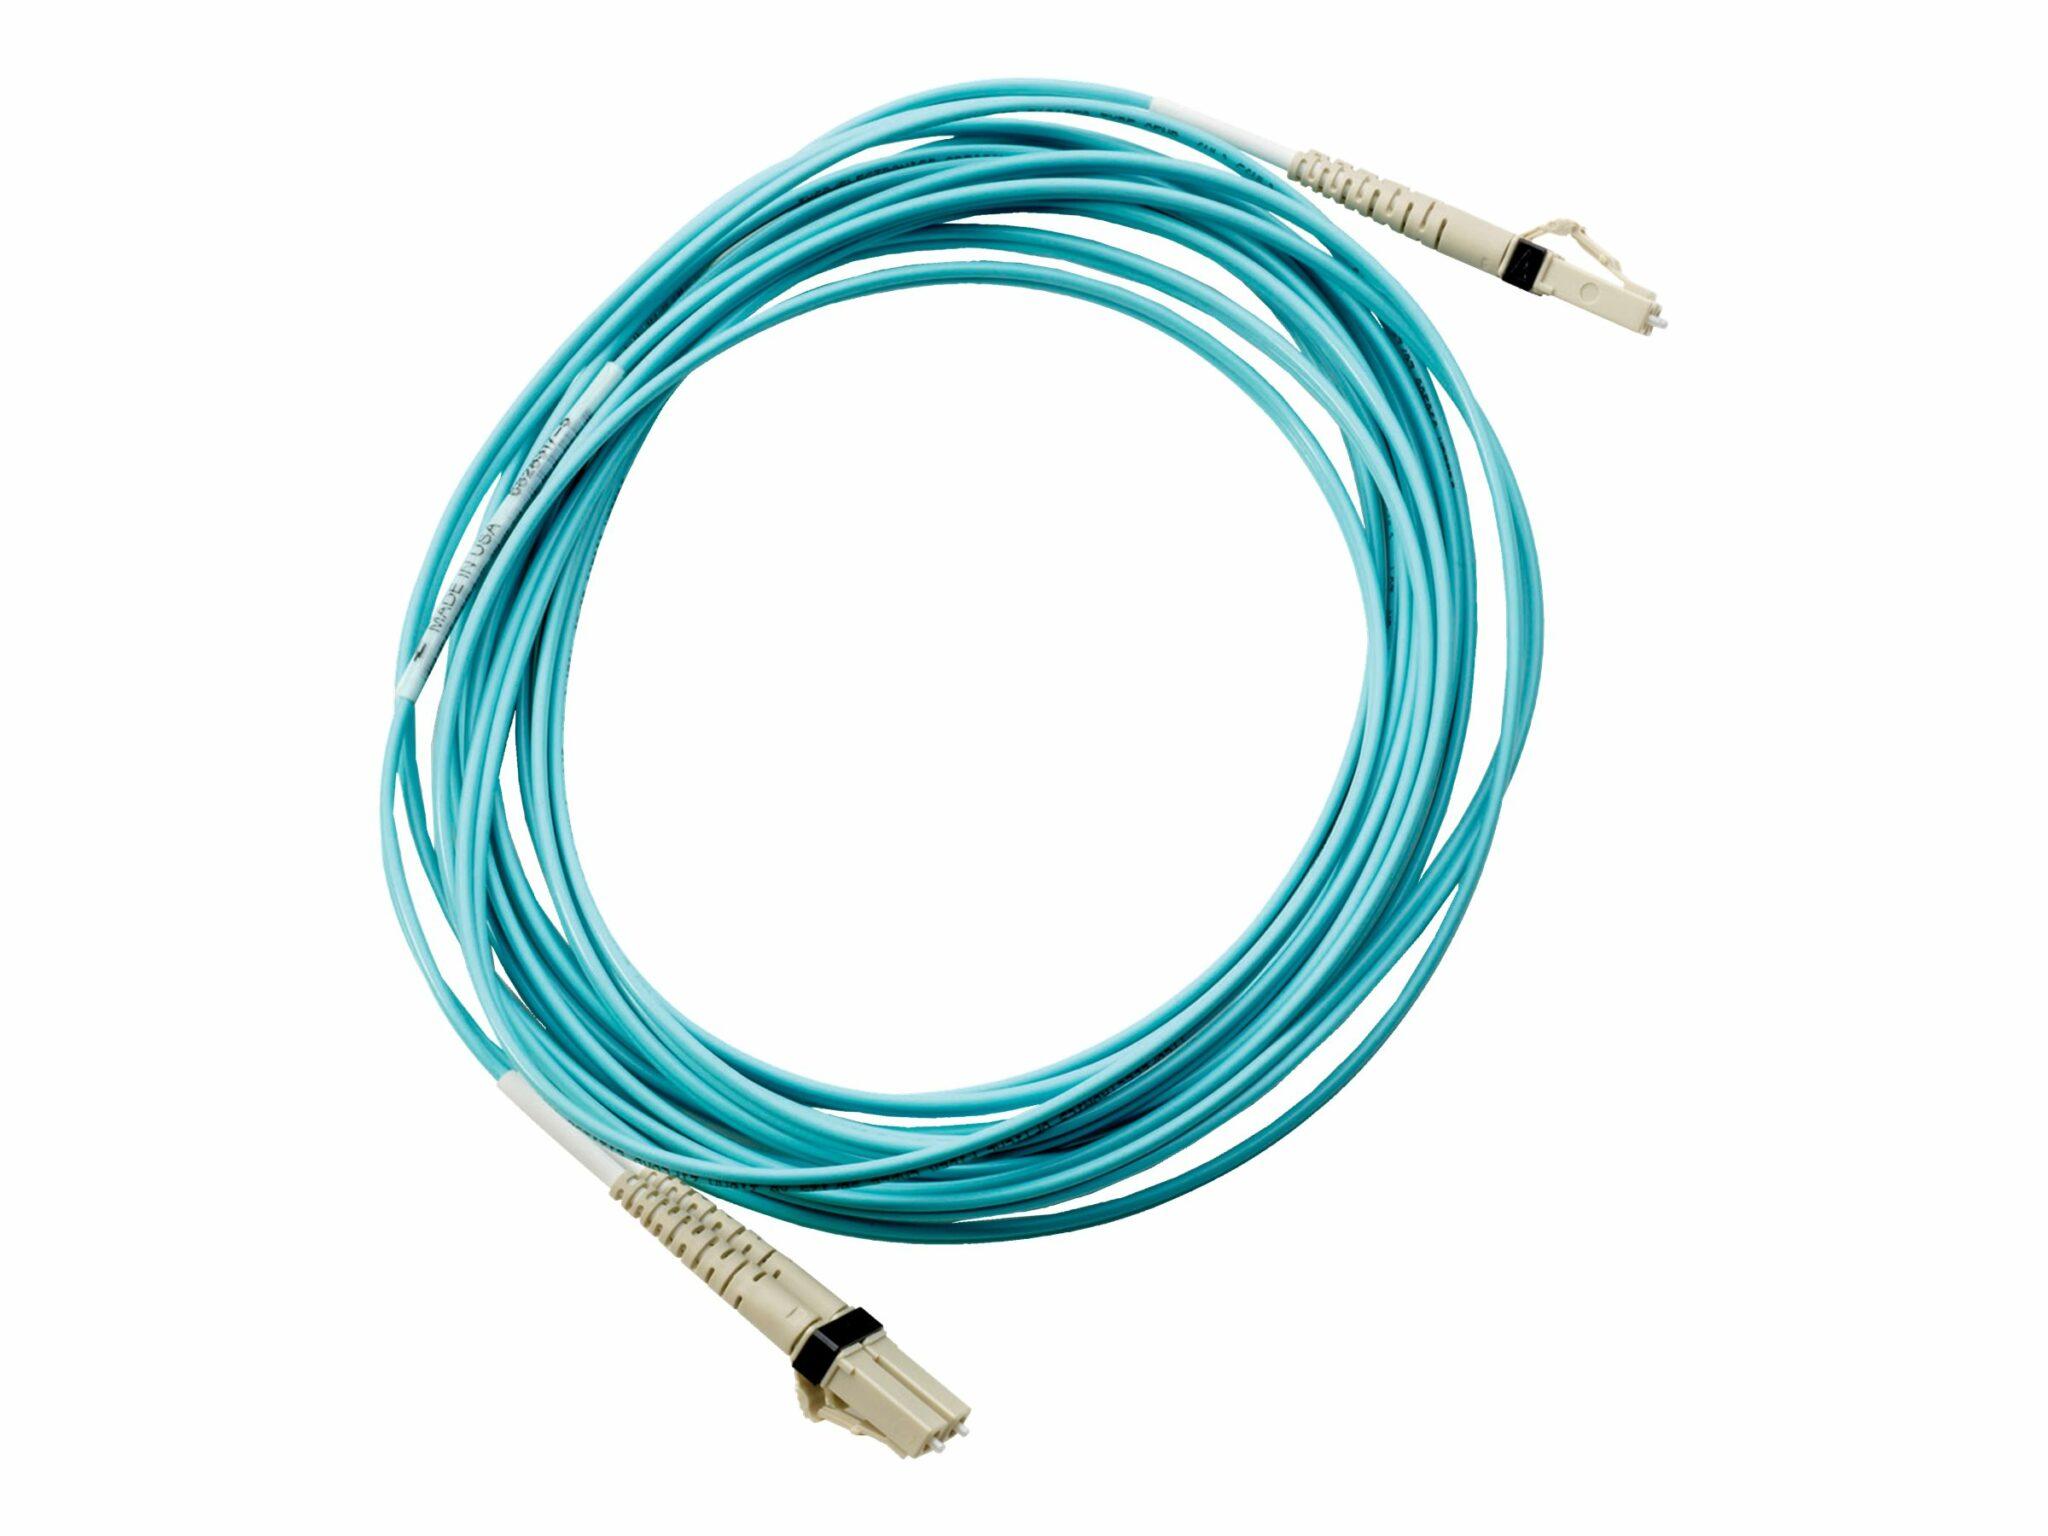 Fine 8 Flex Wire Model - Electric Circuit Diagrams - studiomotiv.net